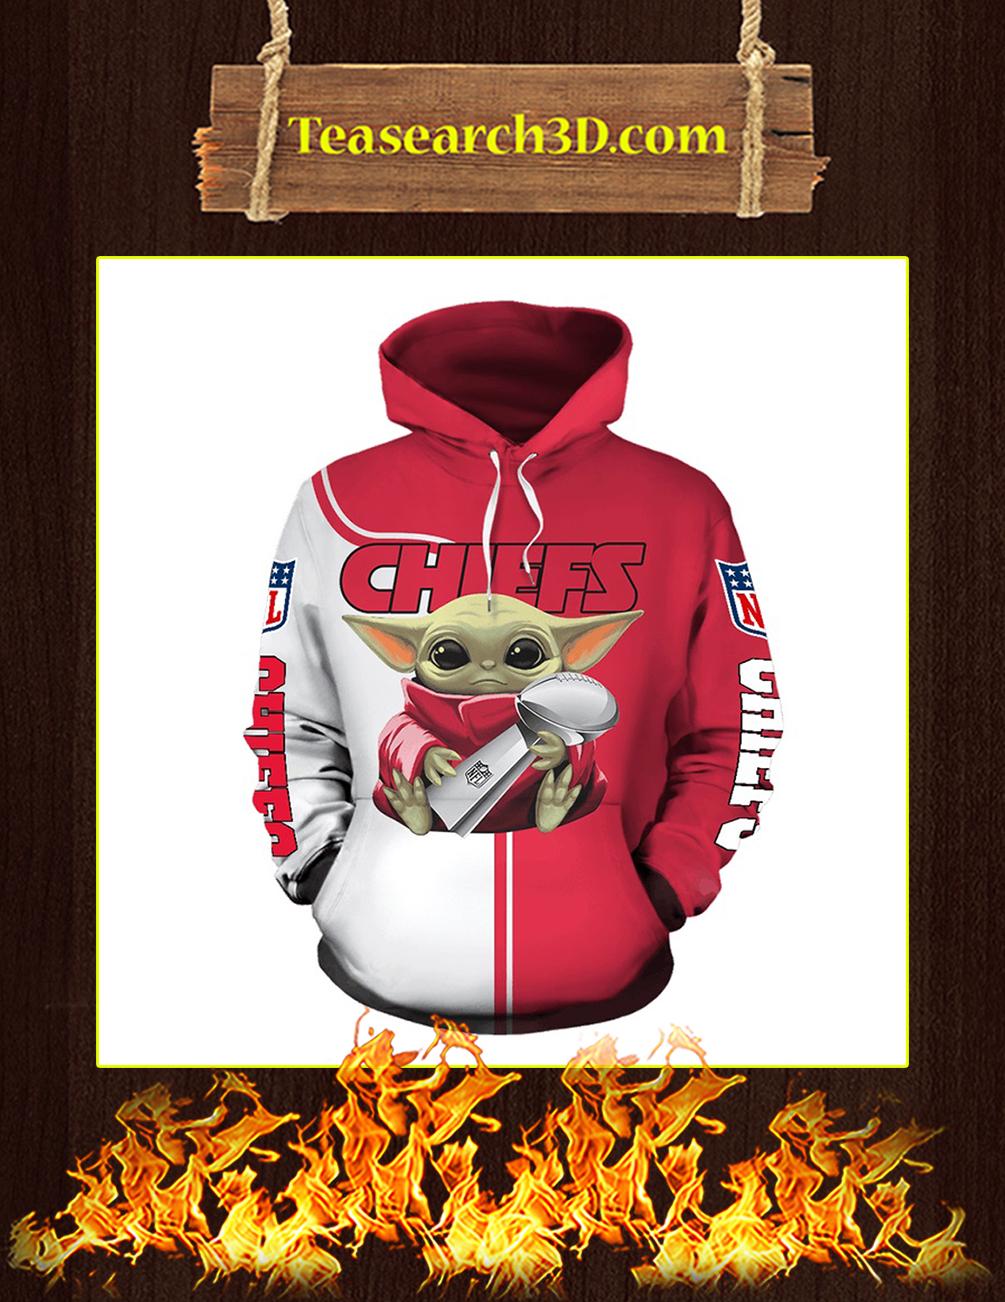 Chiefs Baby Yoda Hug Vince Lombardi Trophy 3D Full Printing Hoodie